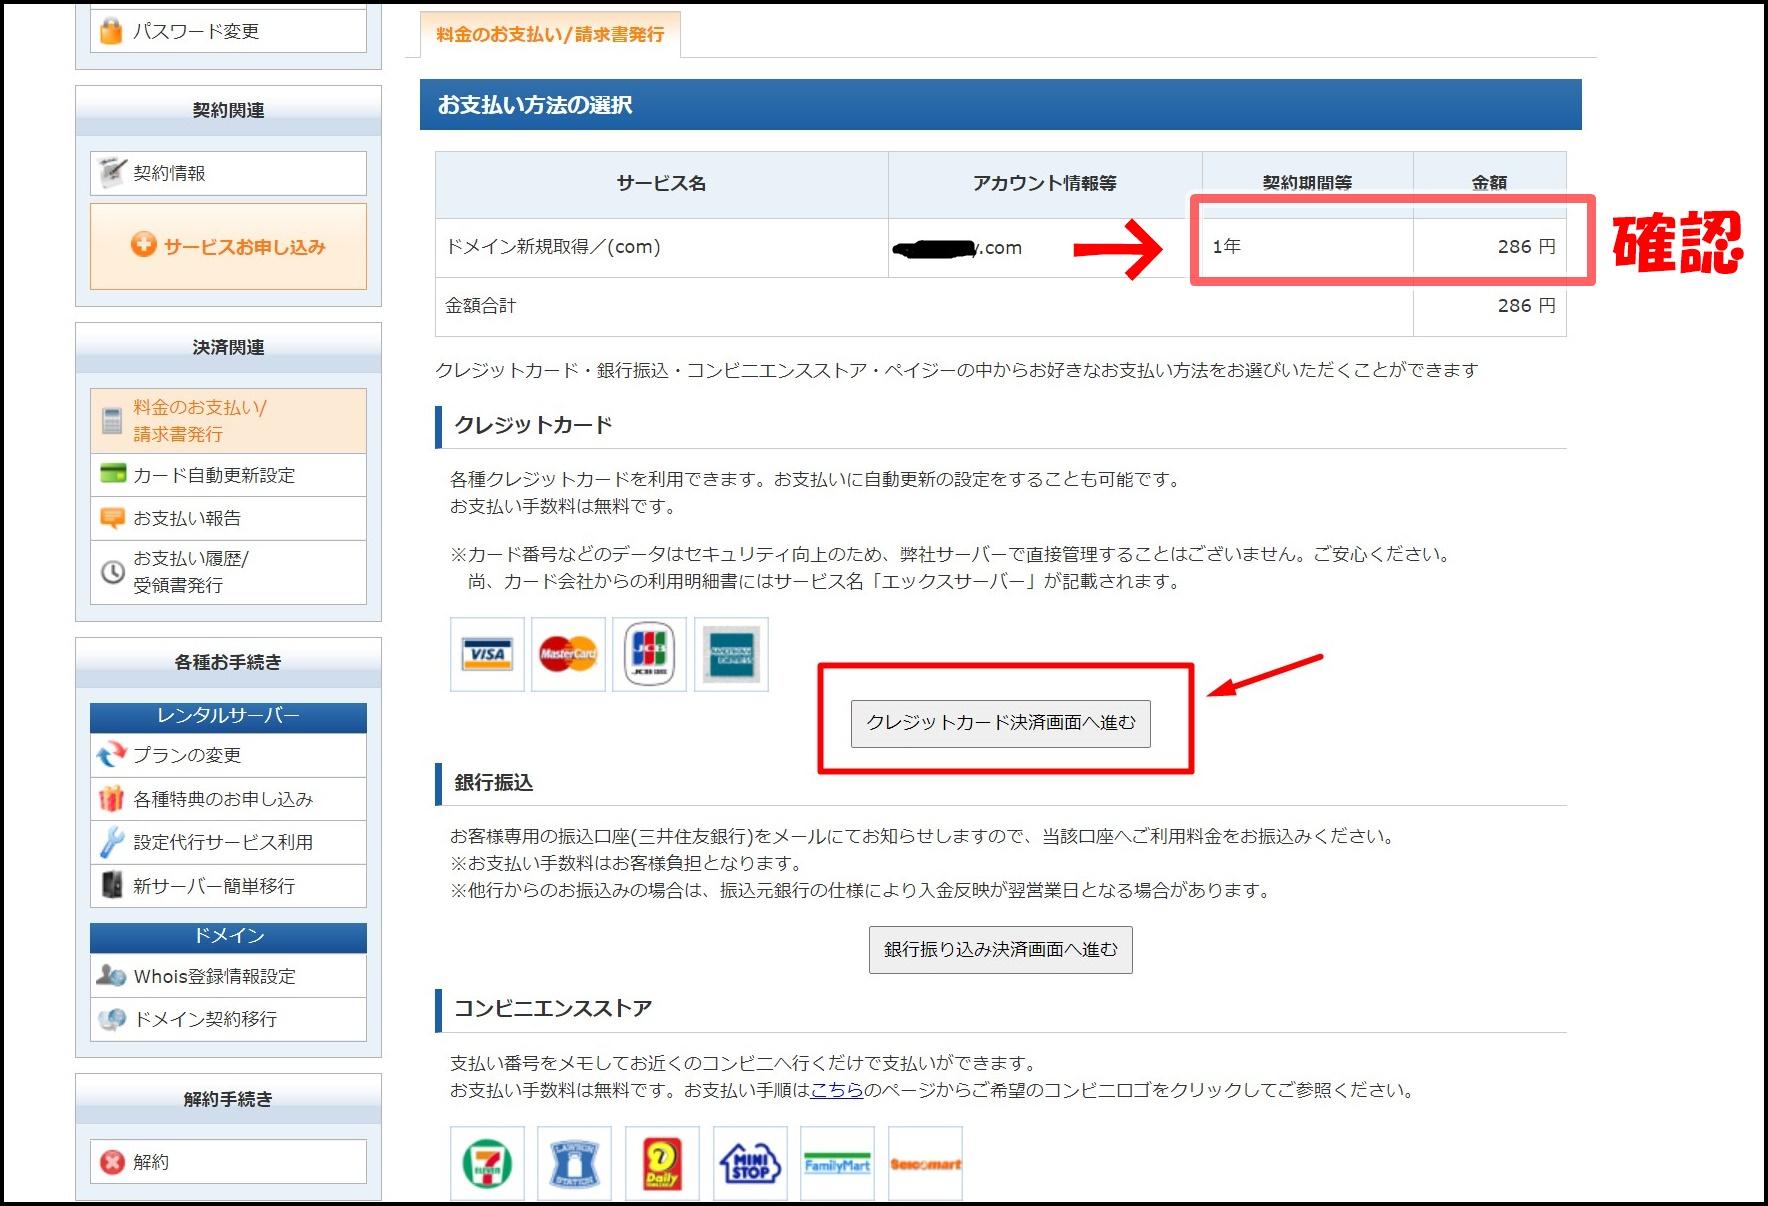 Xserver-domain-payment12